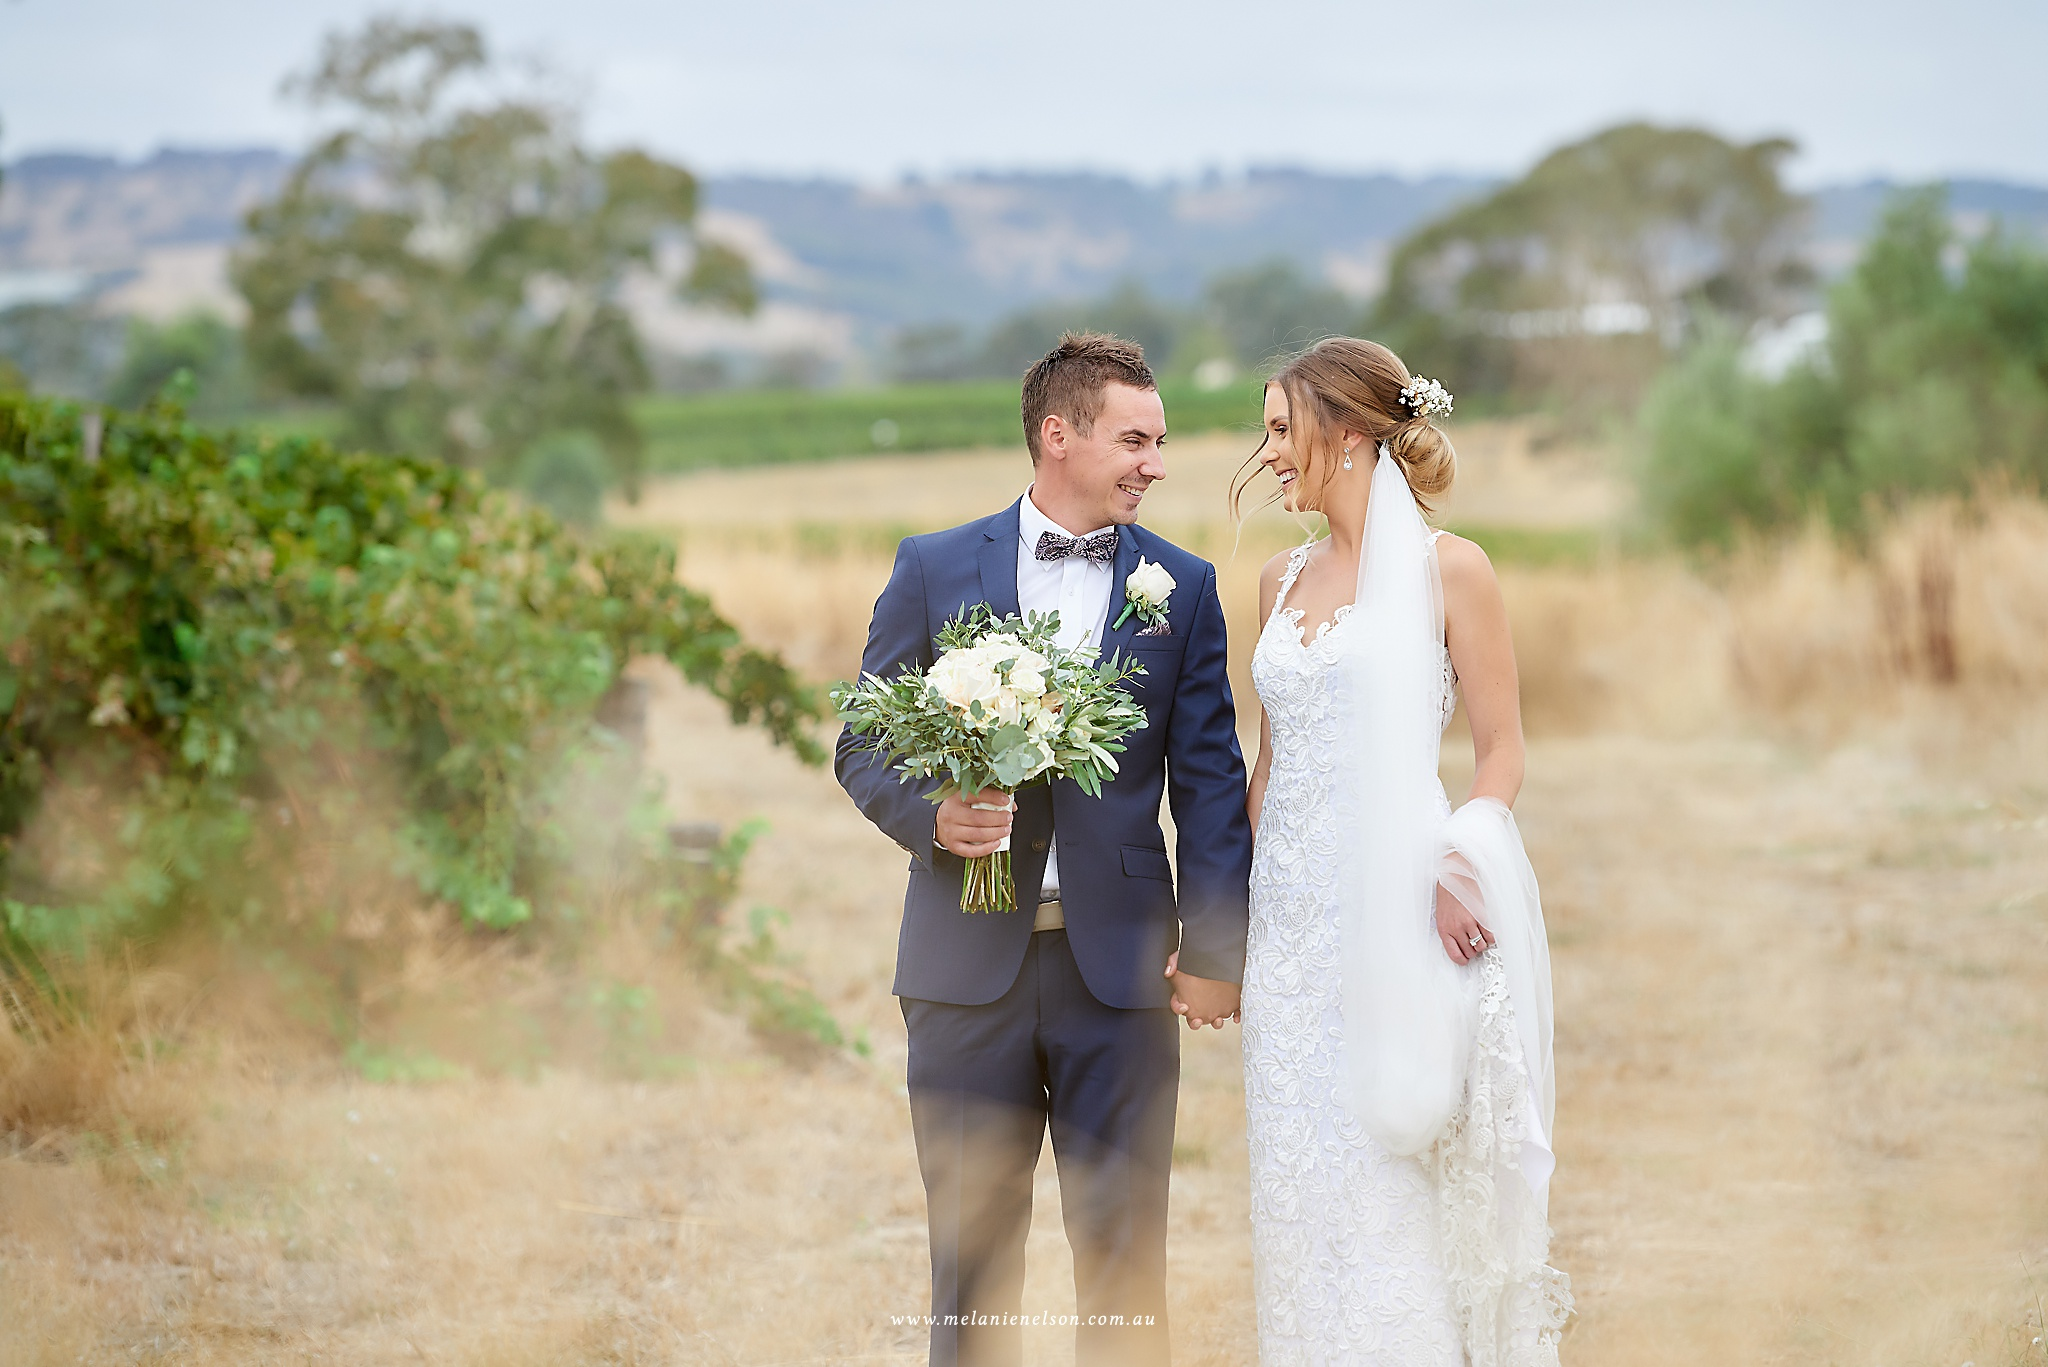 serafino_wedding_photography_0053.jpg